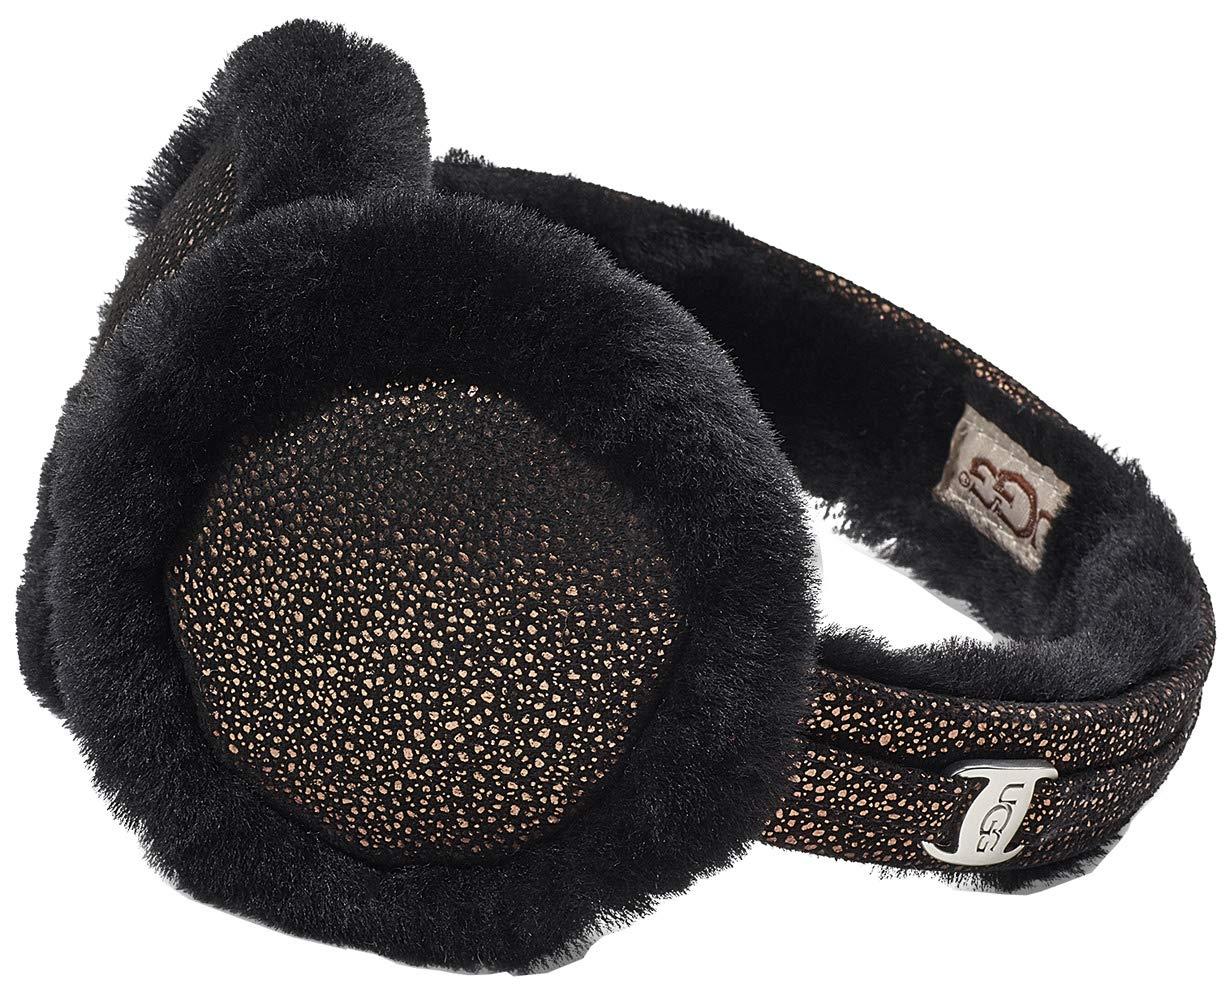 UGG Womens Classic Non-Tech Earmuff in Metallic Black by UGG